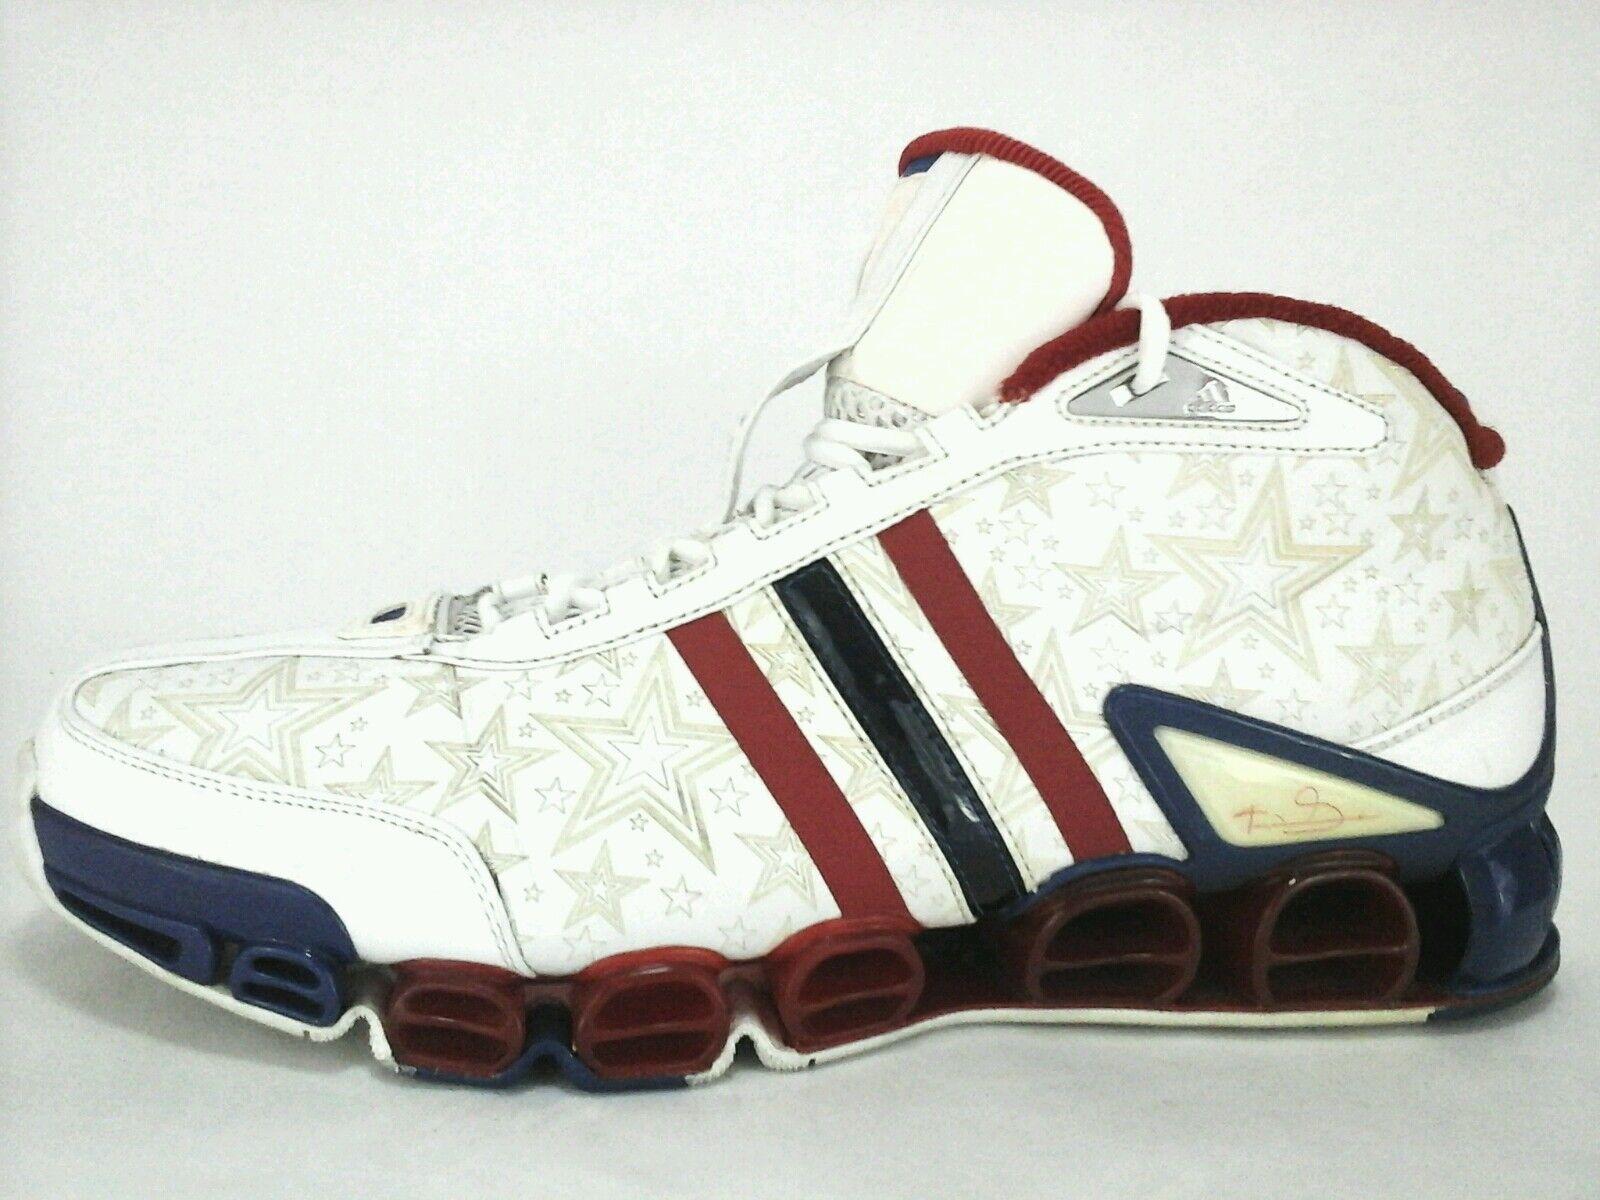 de rares 2005 2005 rares adidas kevin garnett 2malik all star game baskets - nous 15 a4cbe5